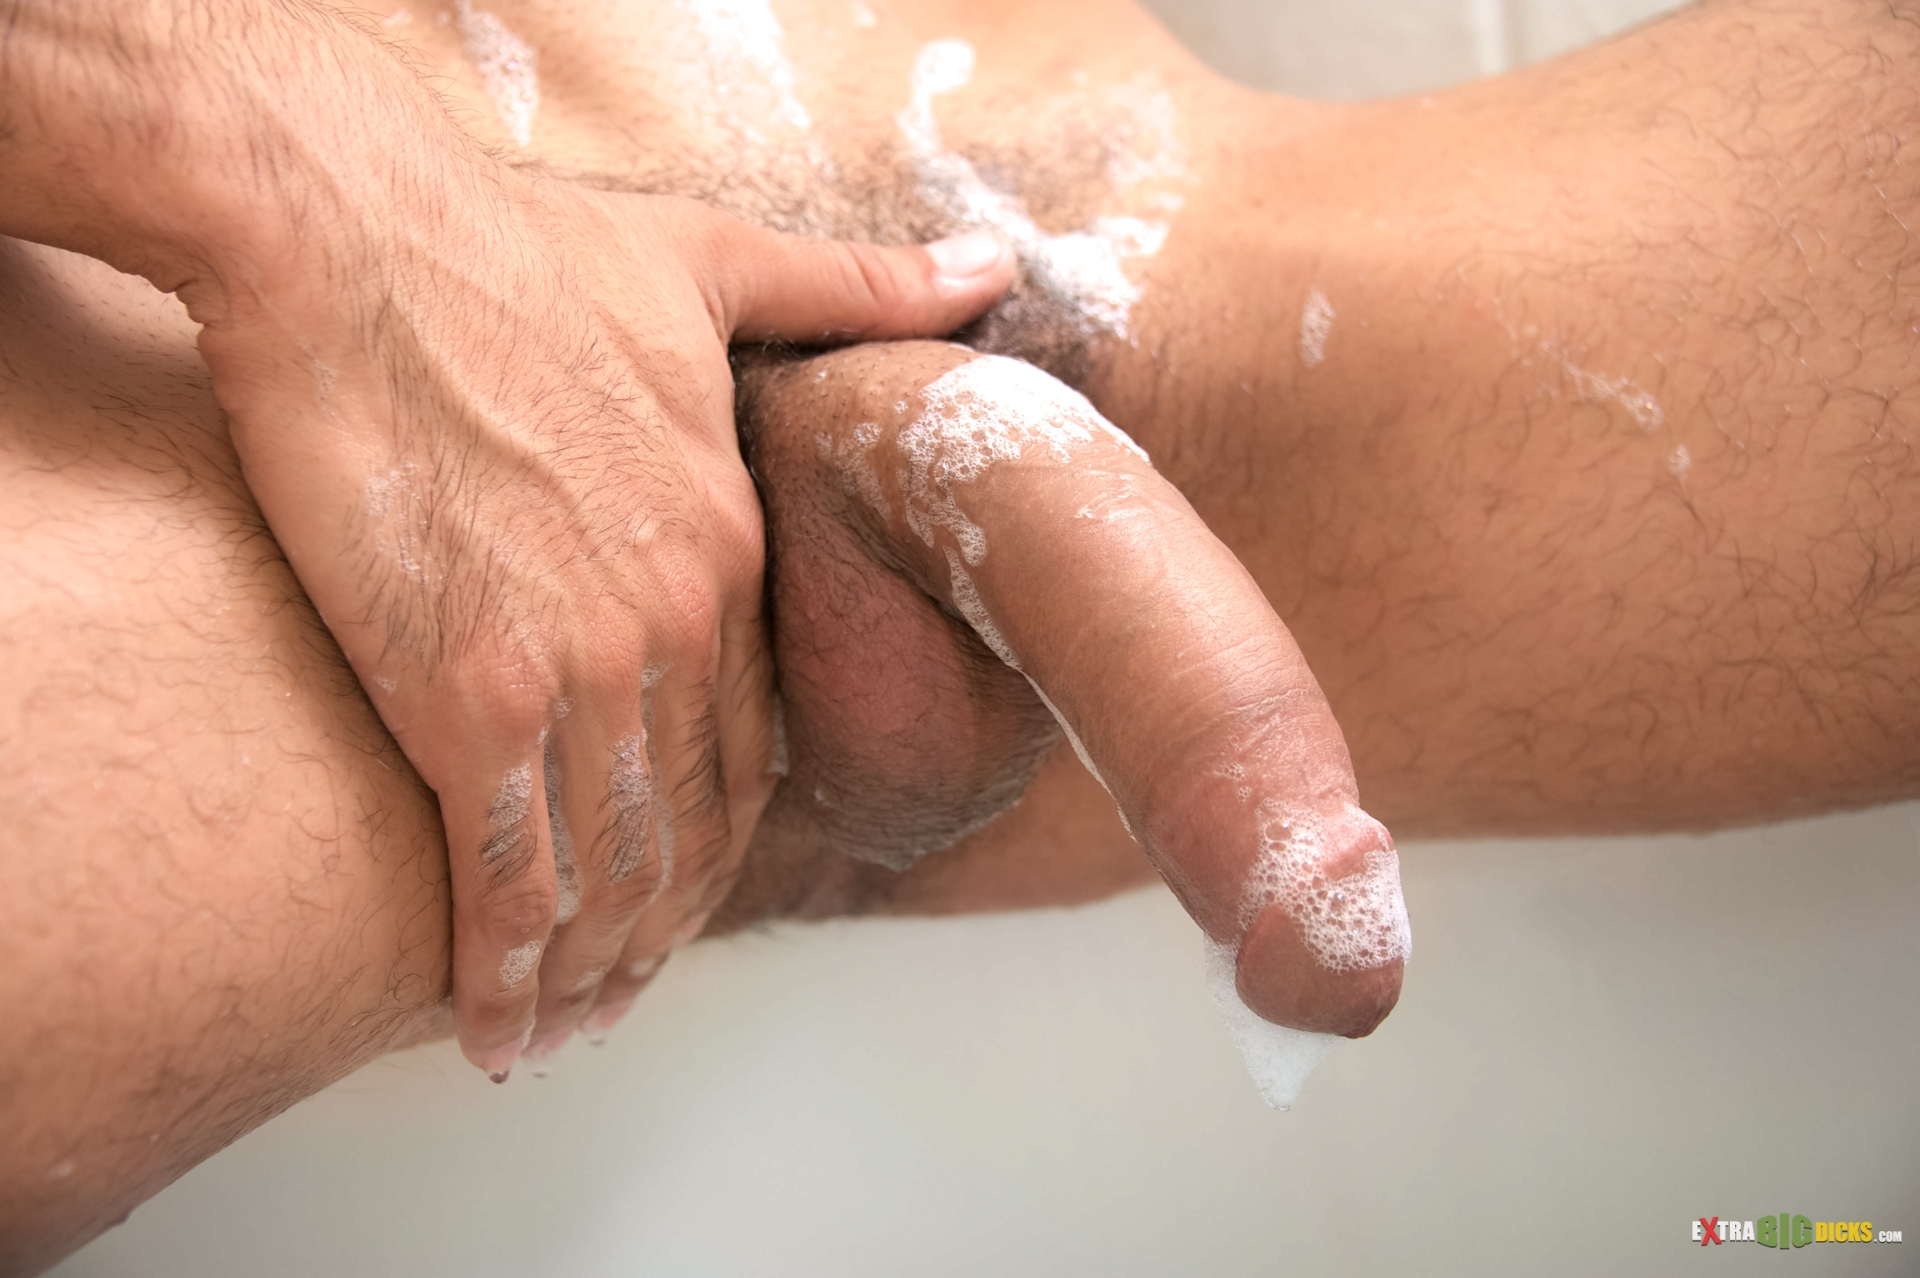 Free shower jerk off porn pics